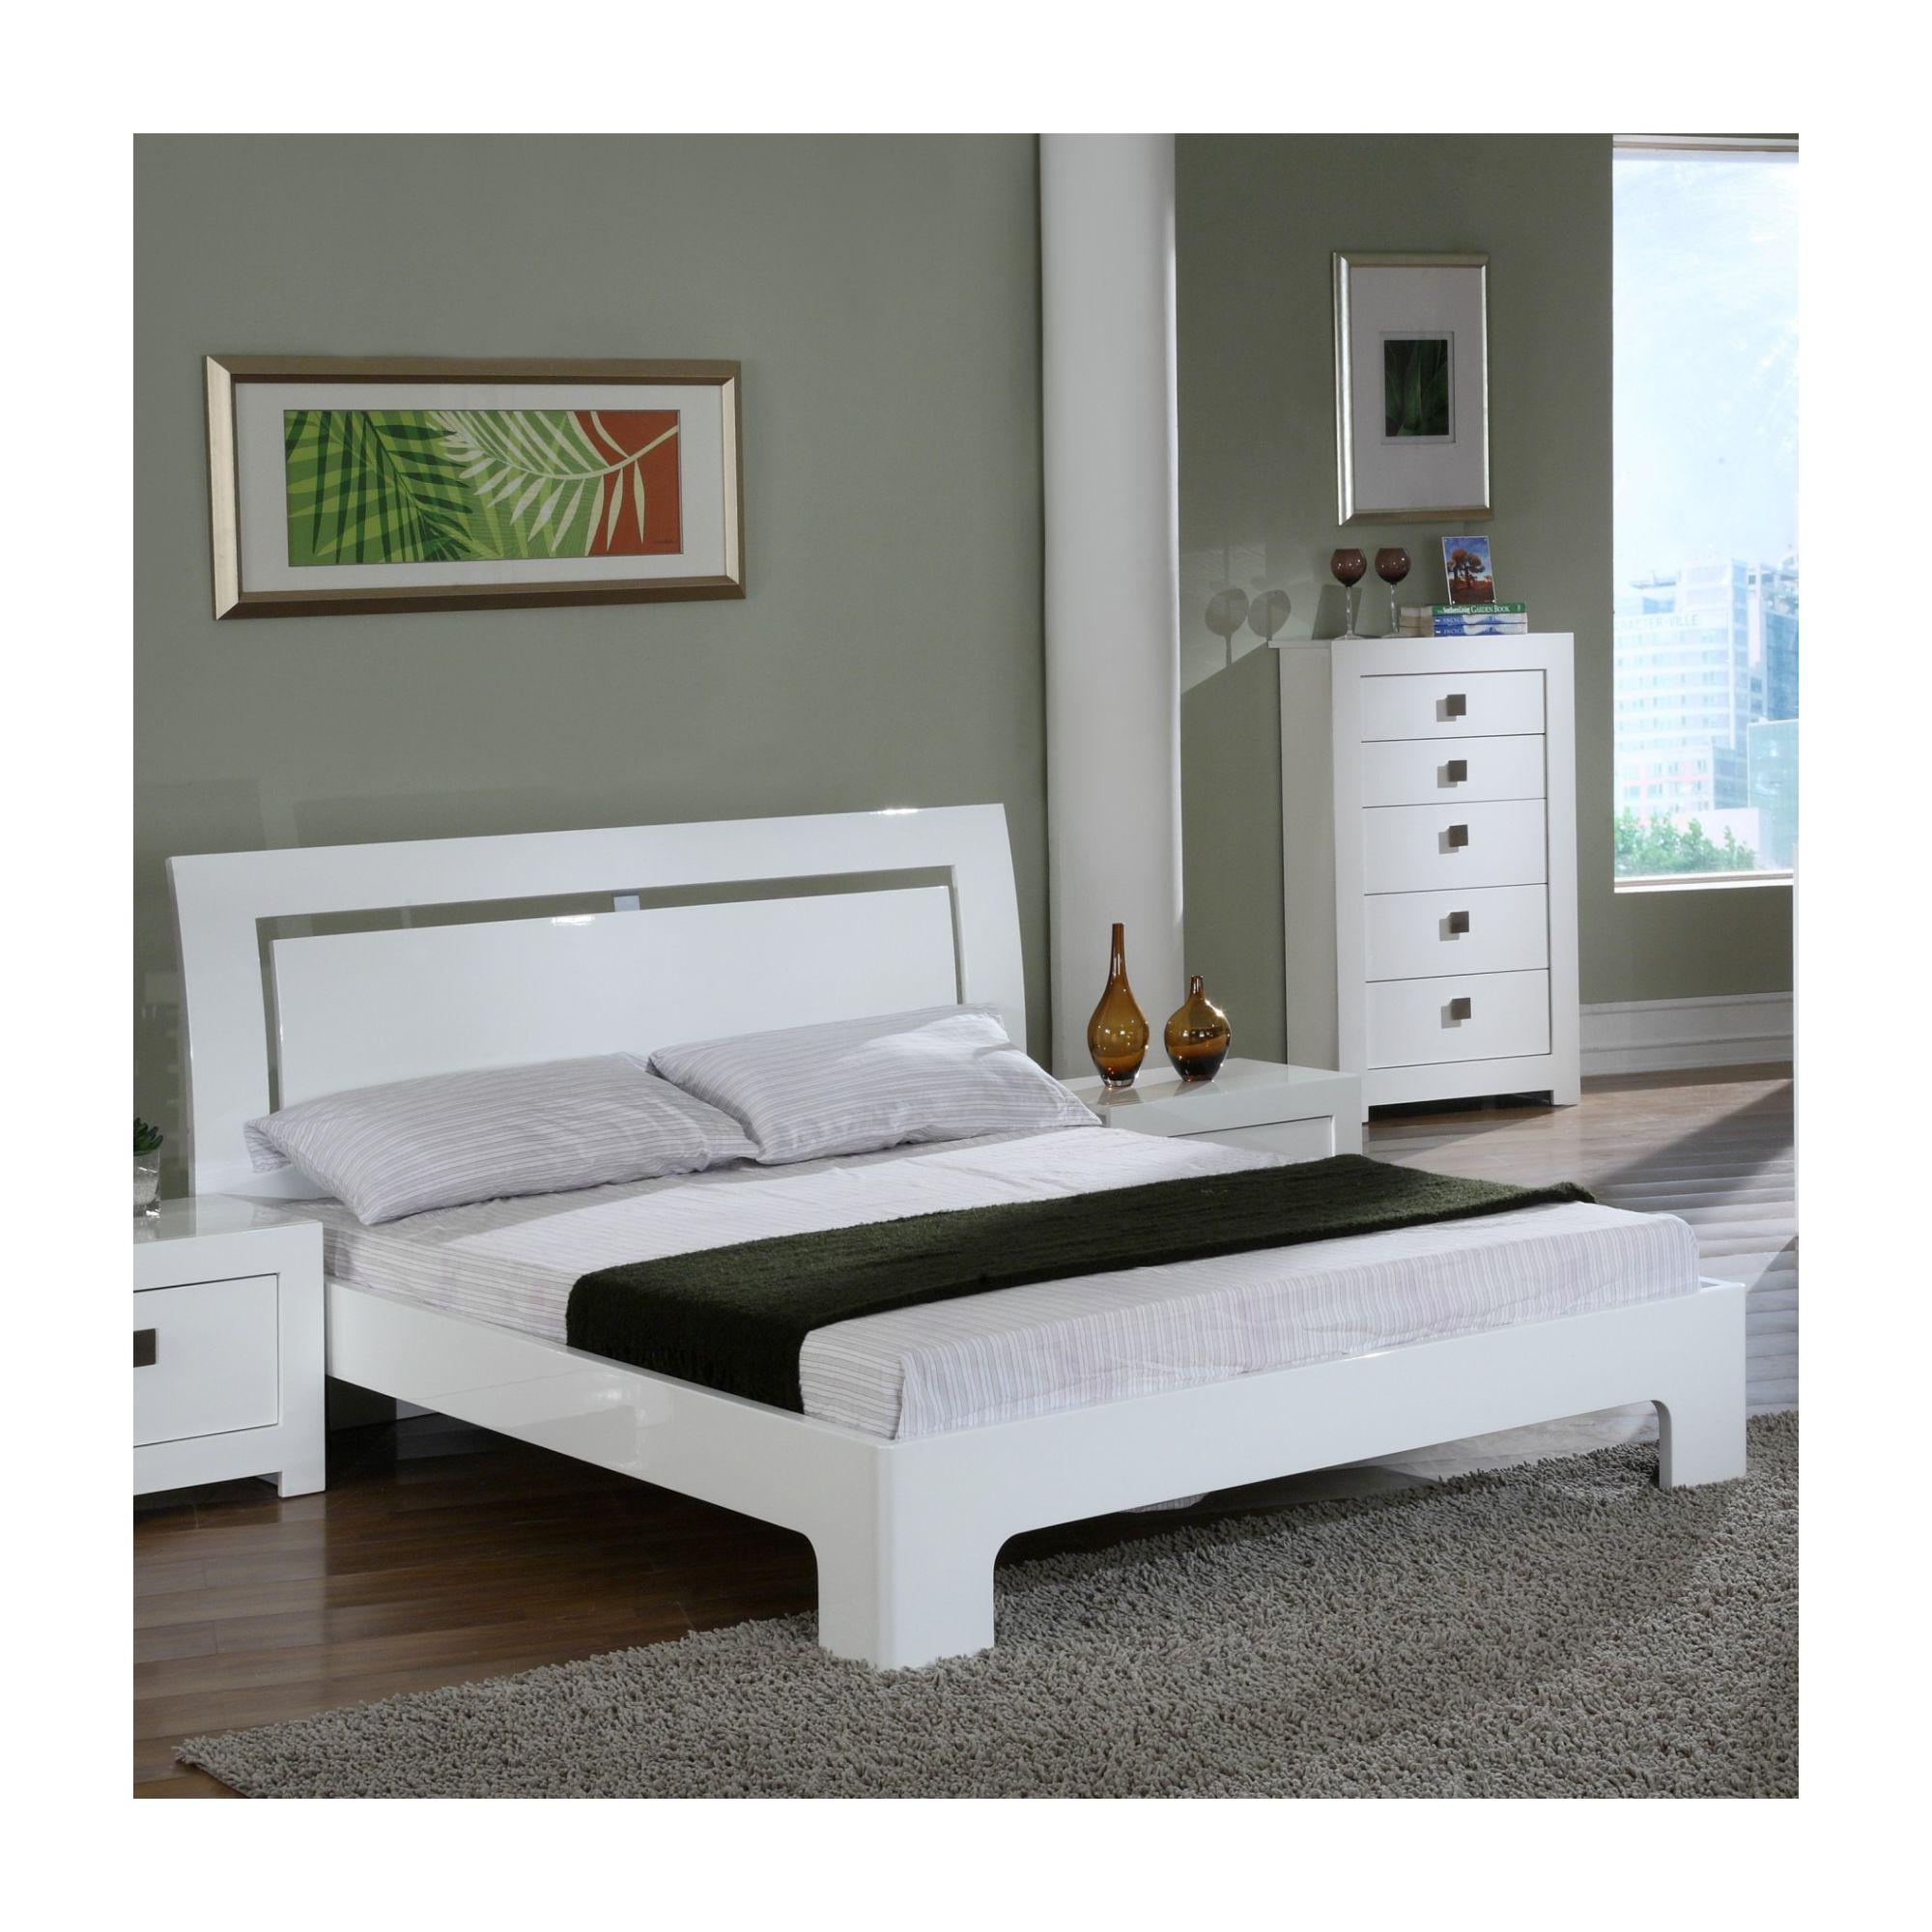 World Furniture Bari Bed Frame - Single at Tesco Direct